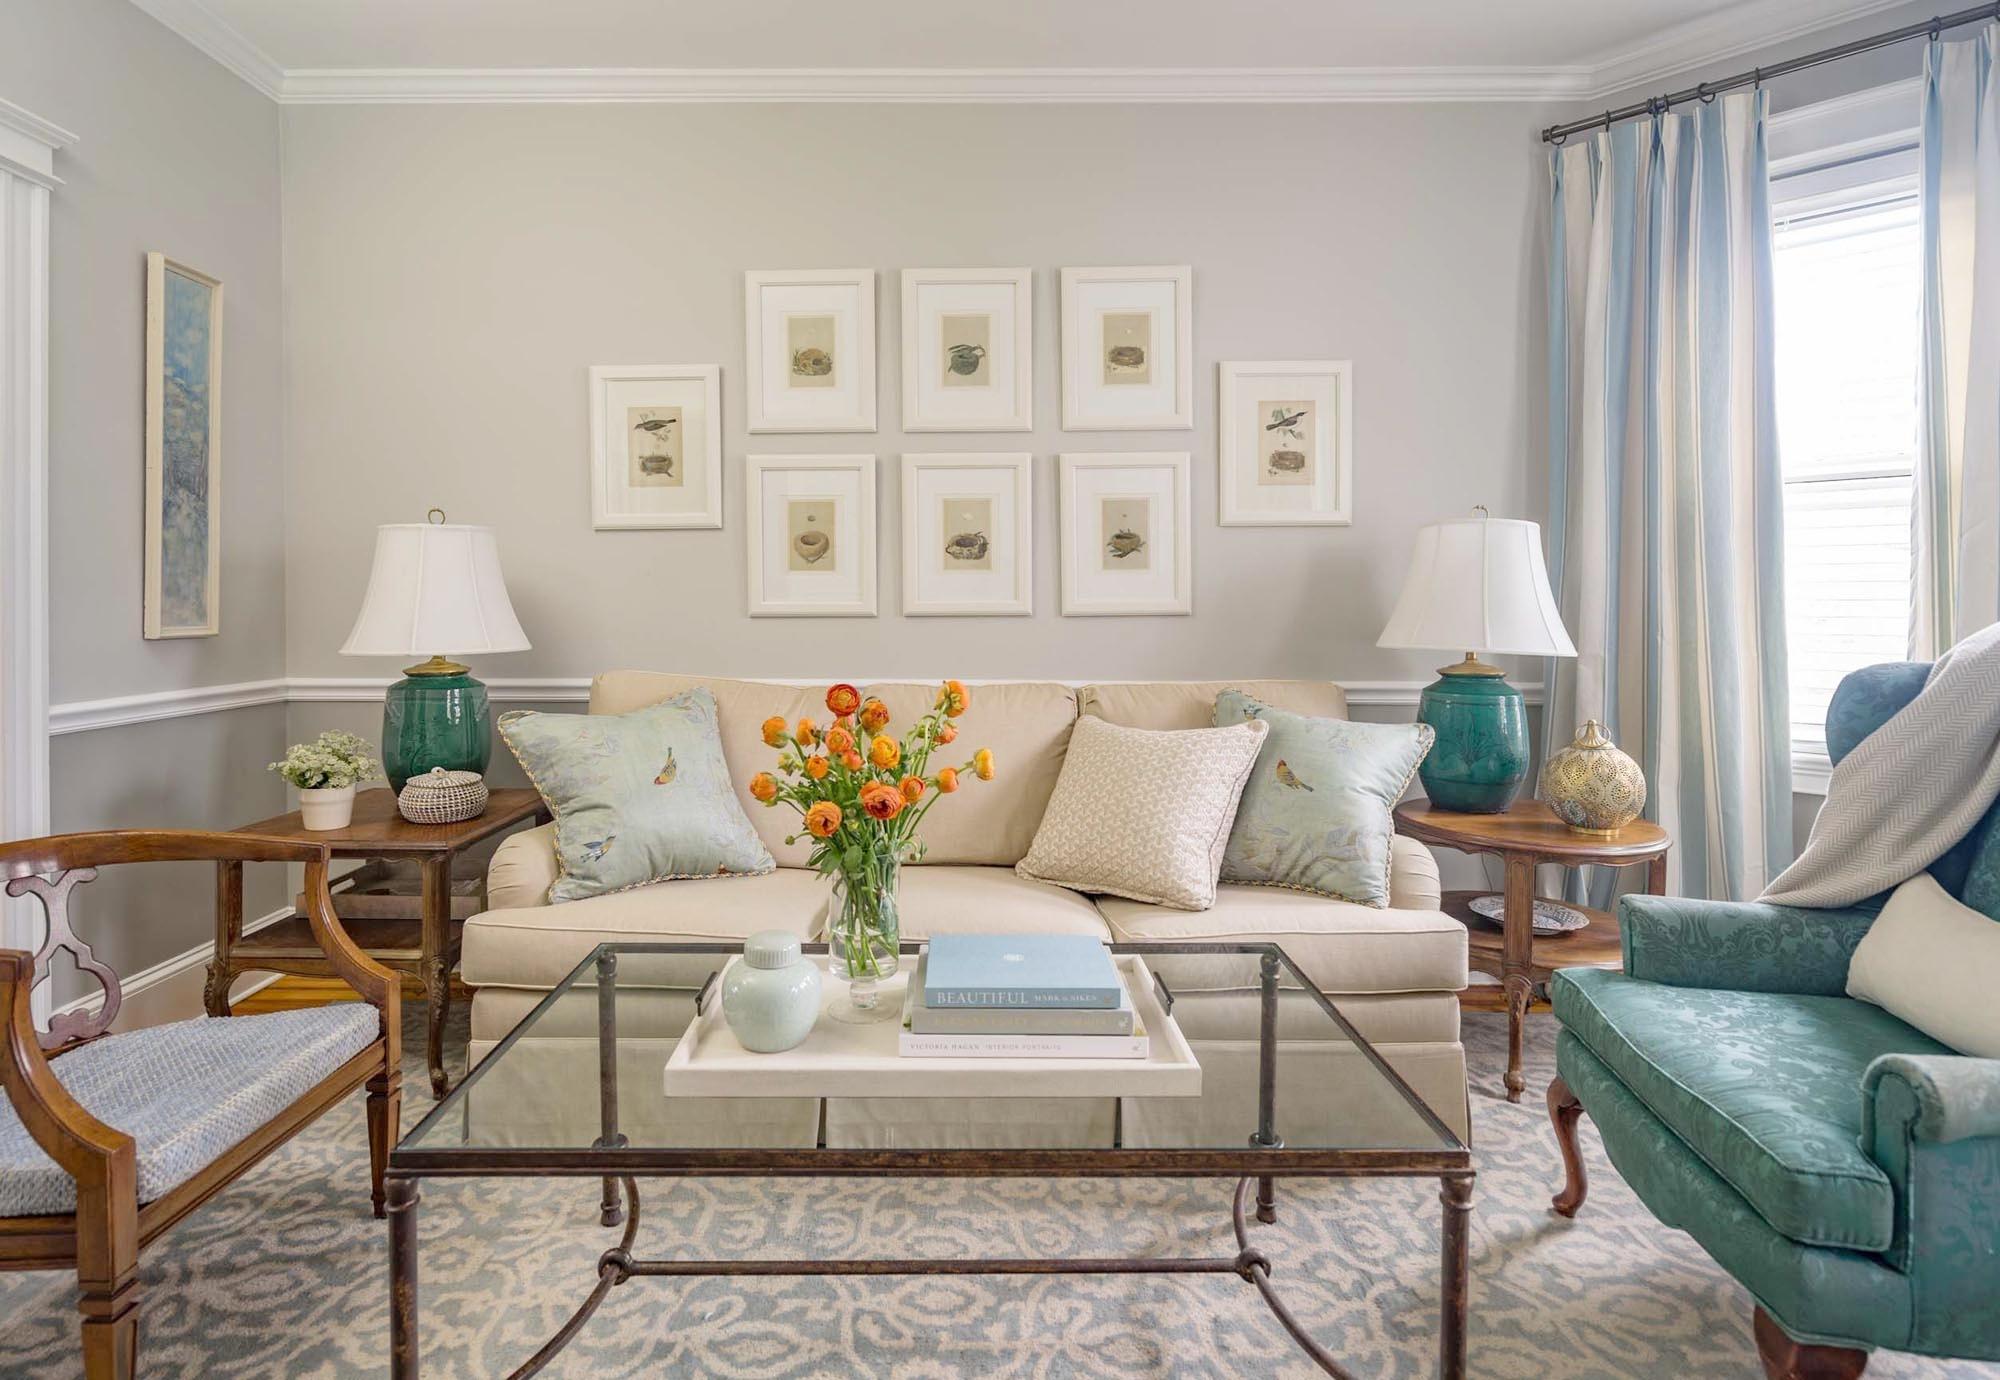 Boston living room interior design by Dane Austin Design